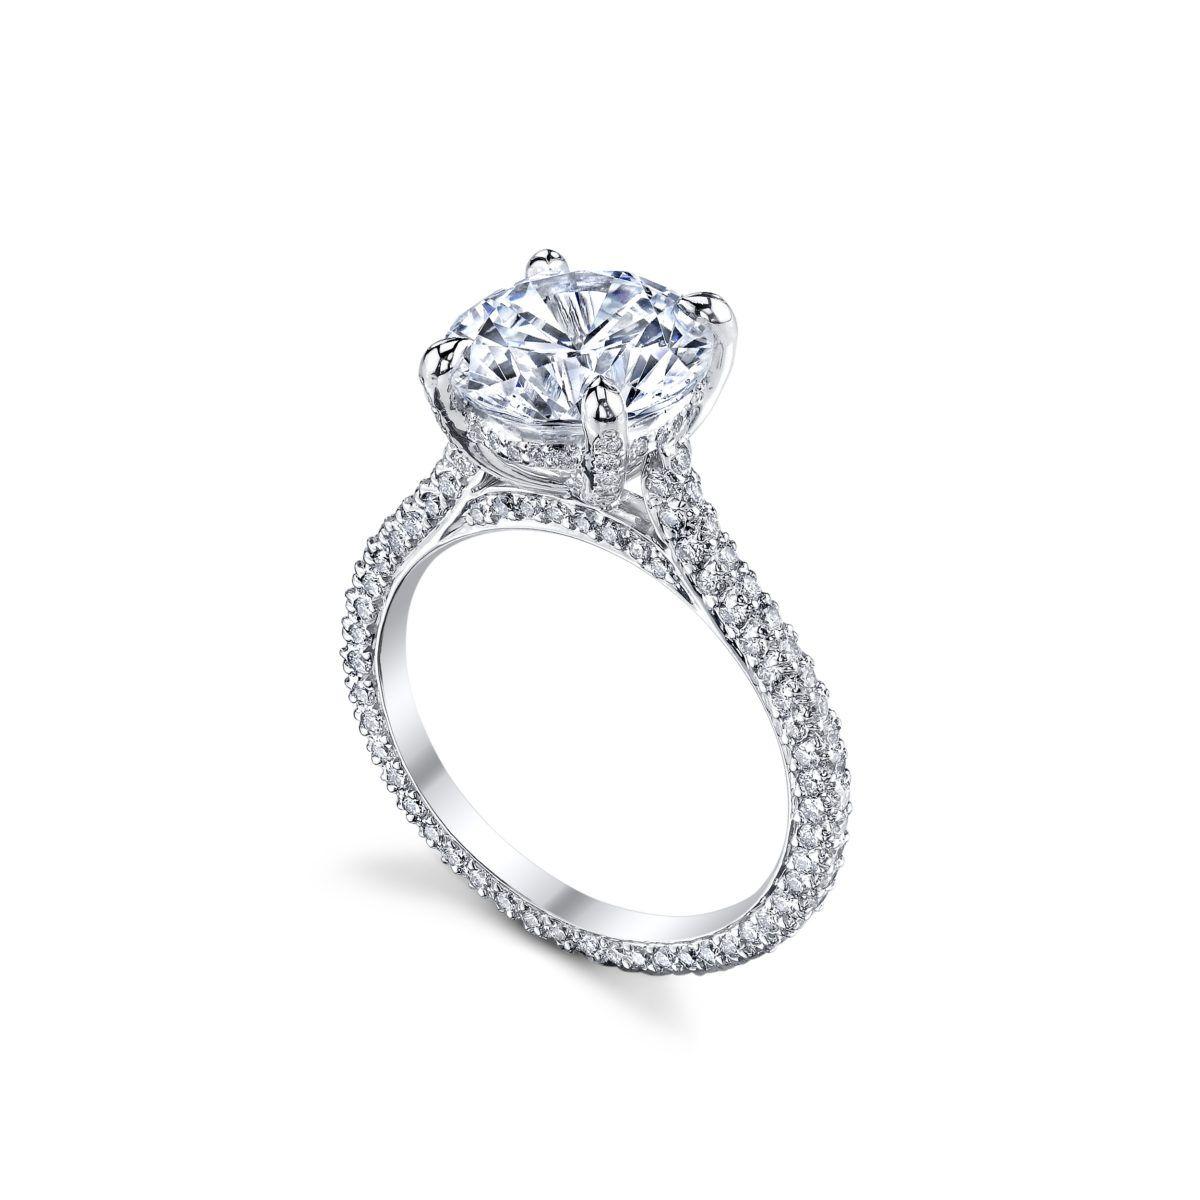 Michael B Paris Pave Diamond Engagement Ring Marshall Pierce Chicago Jewelry Rings Engagement Pave Engagement Ring Dream Diamond Ring